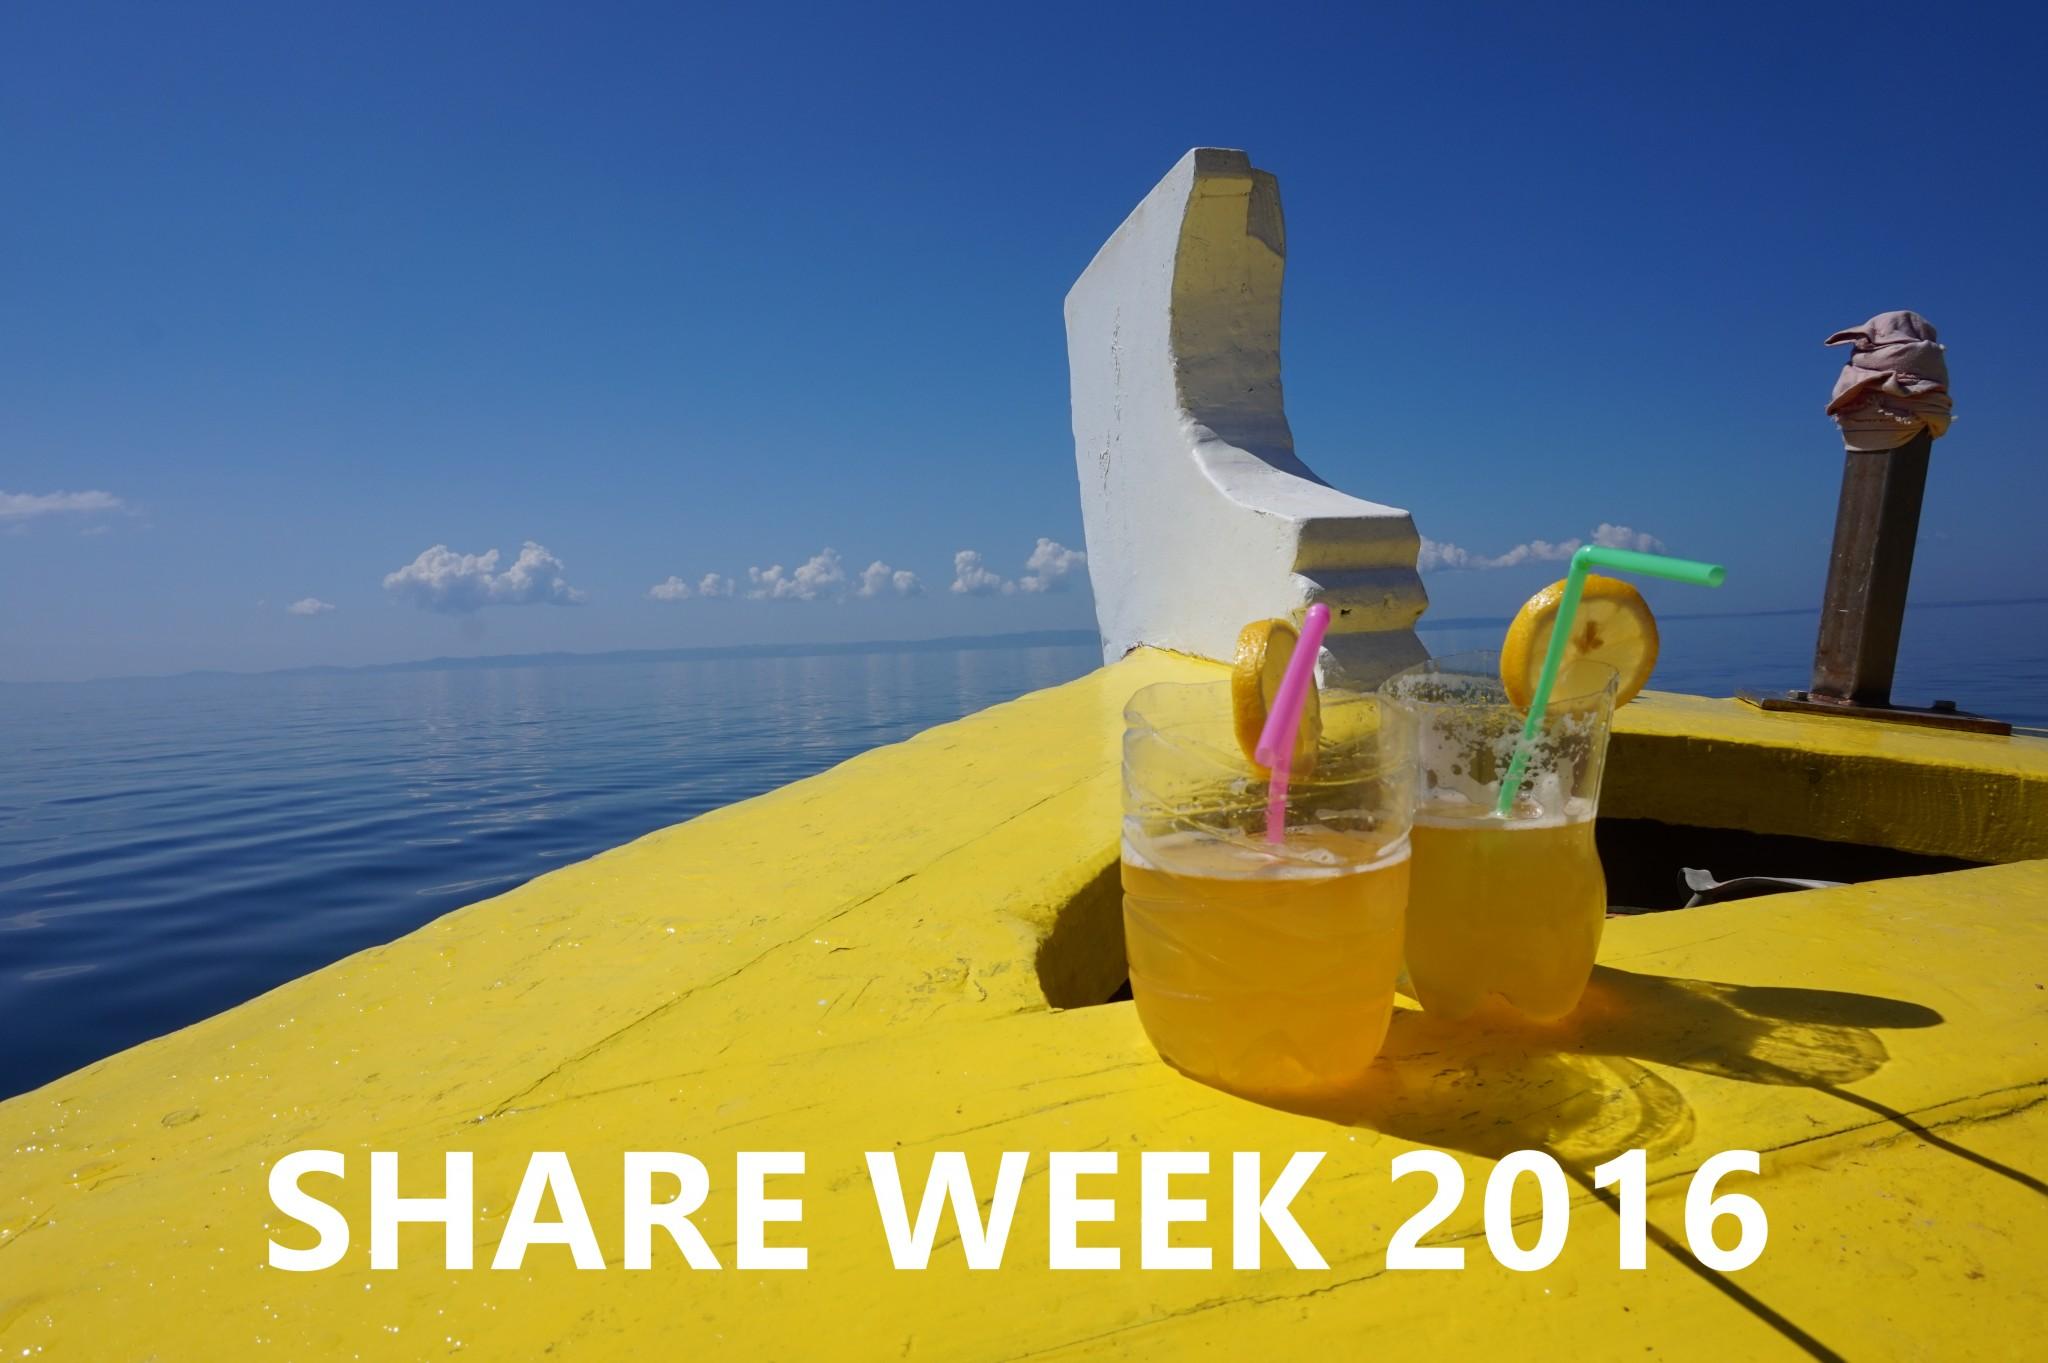 Share week 2016